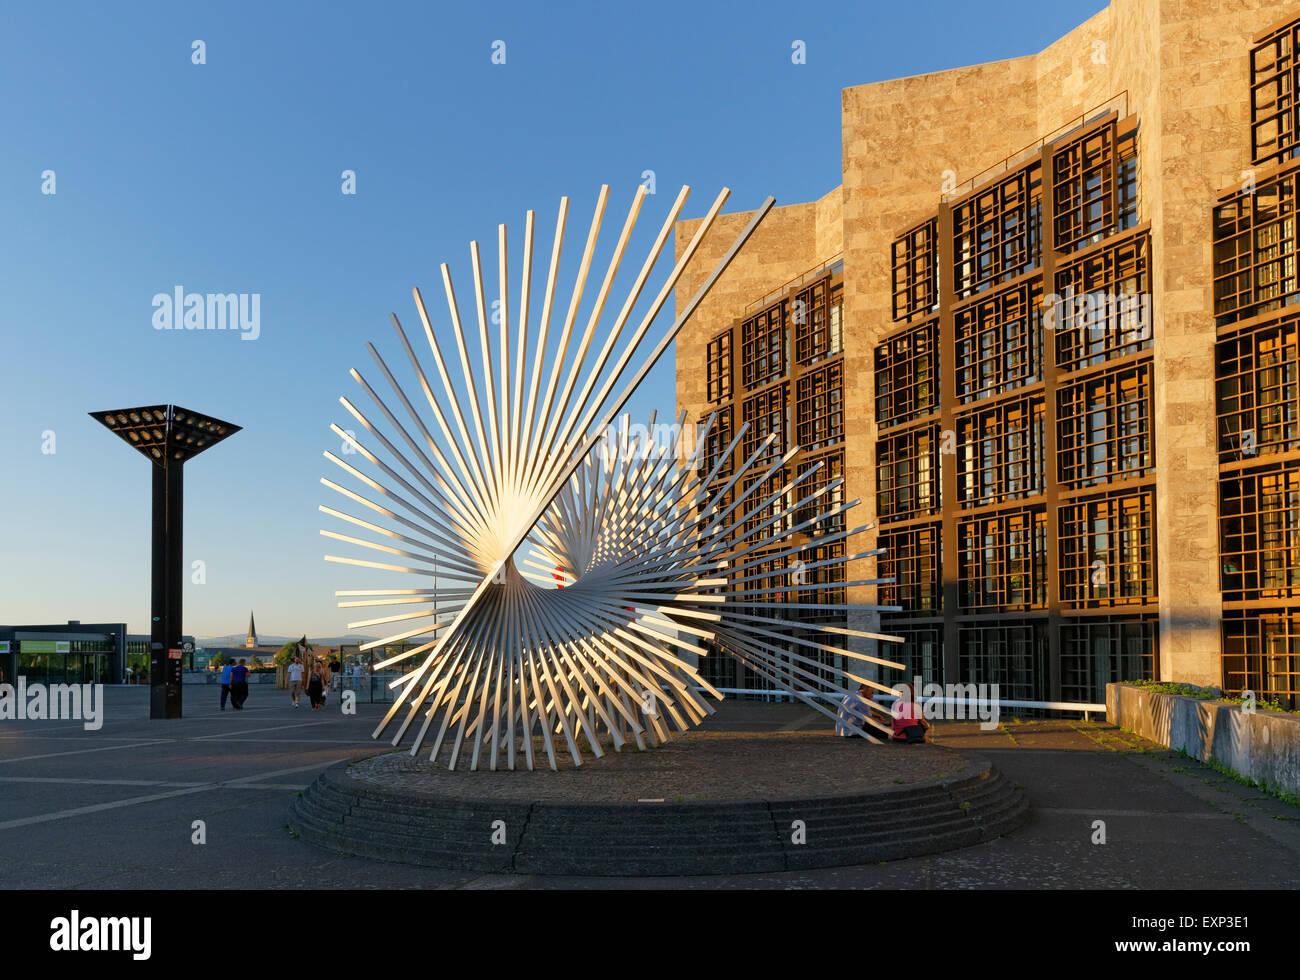 La vitalité de la sculpture par Andreu Alfaro et l'hôtel de ville, Jockel-Fuchs-Platz, Mayence, Rhénanie Photo Stock